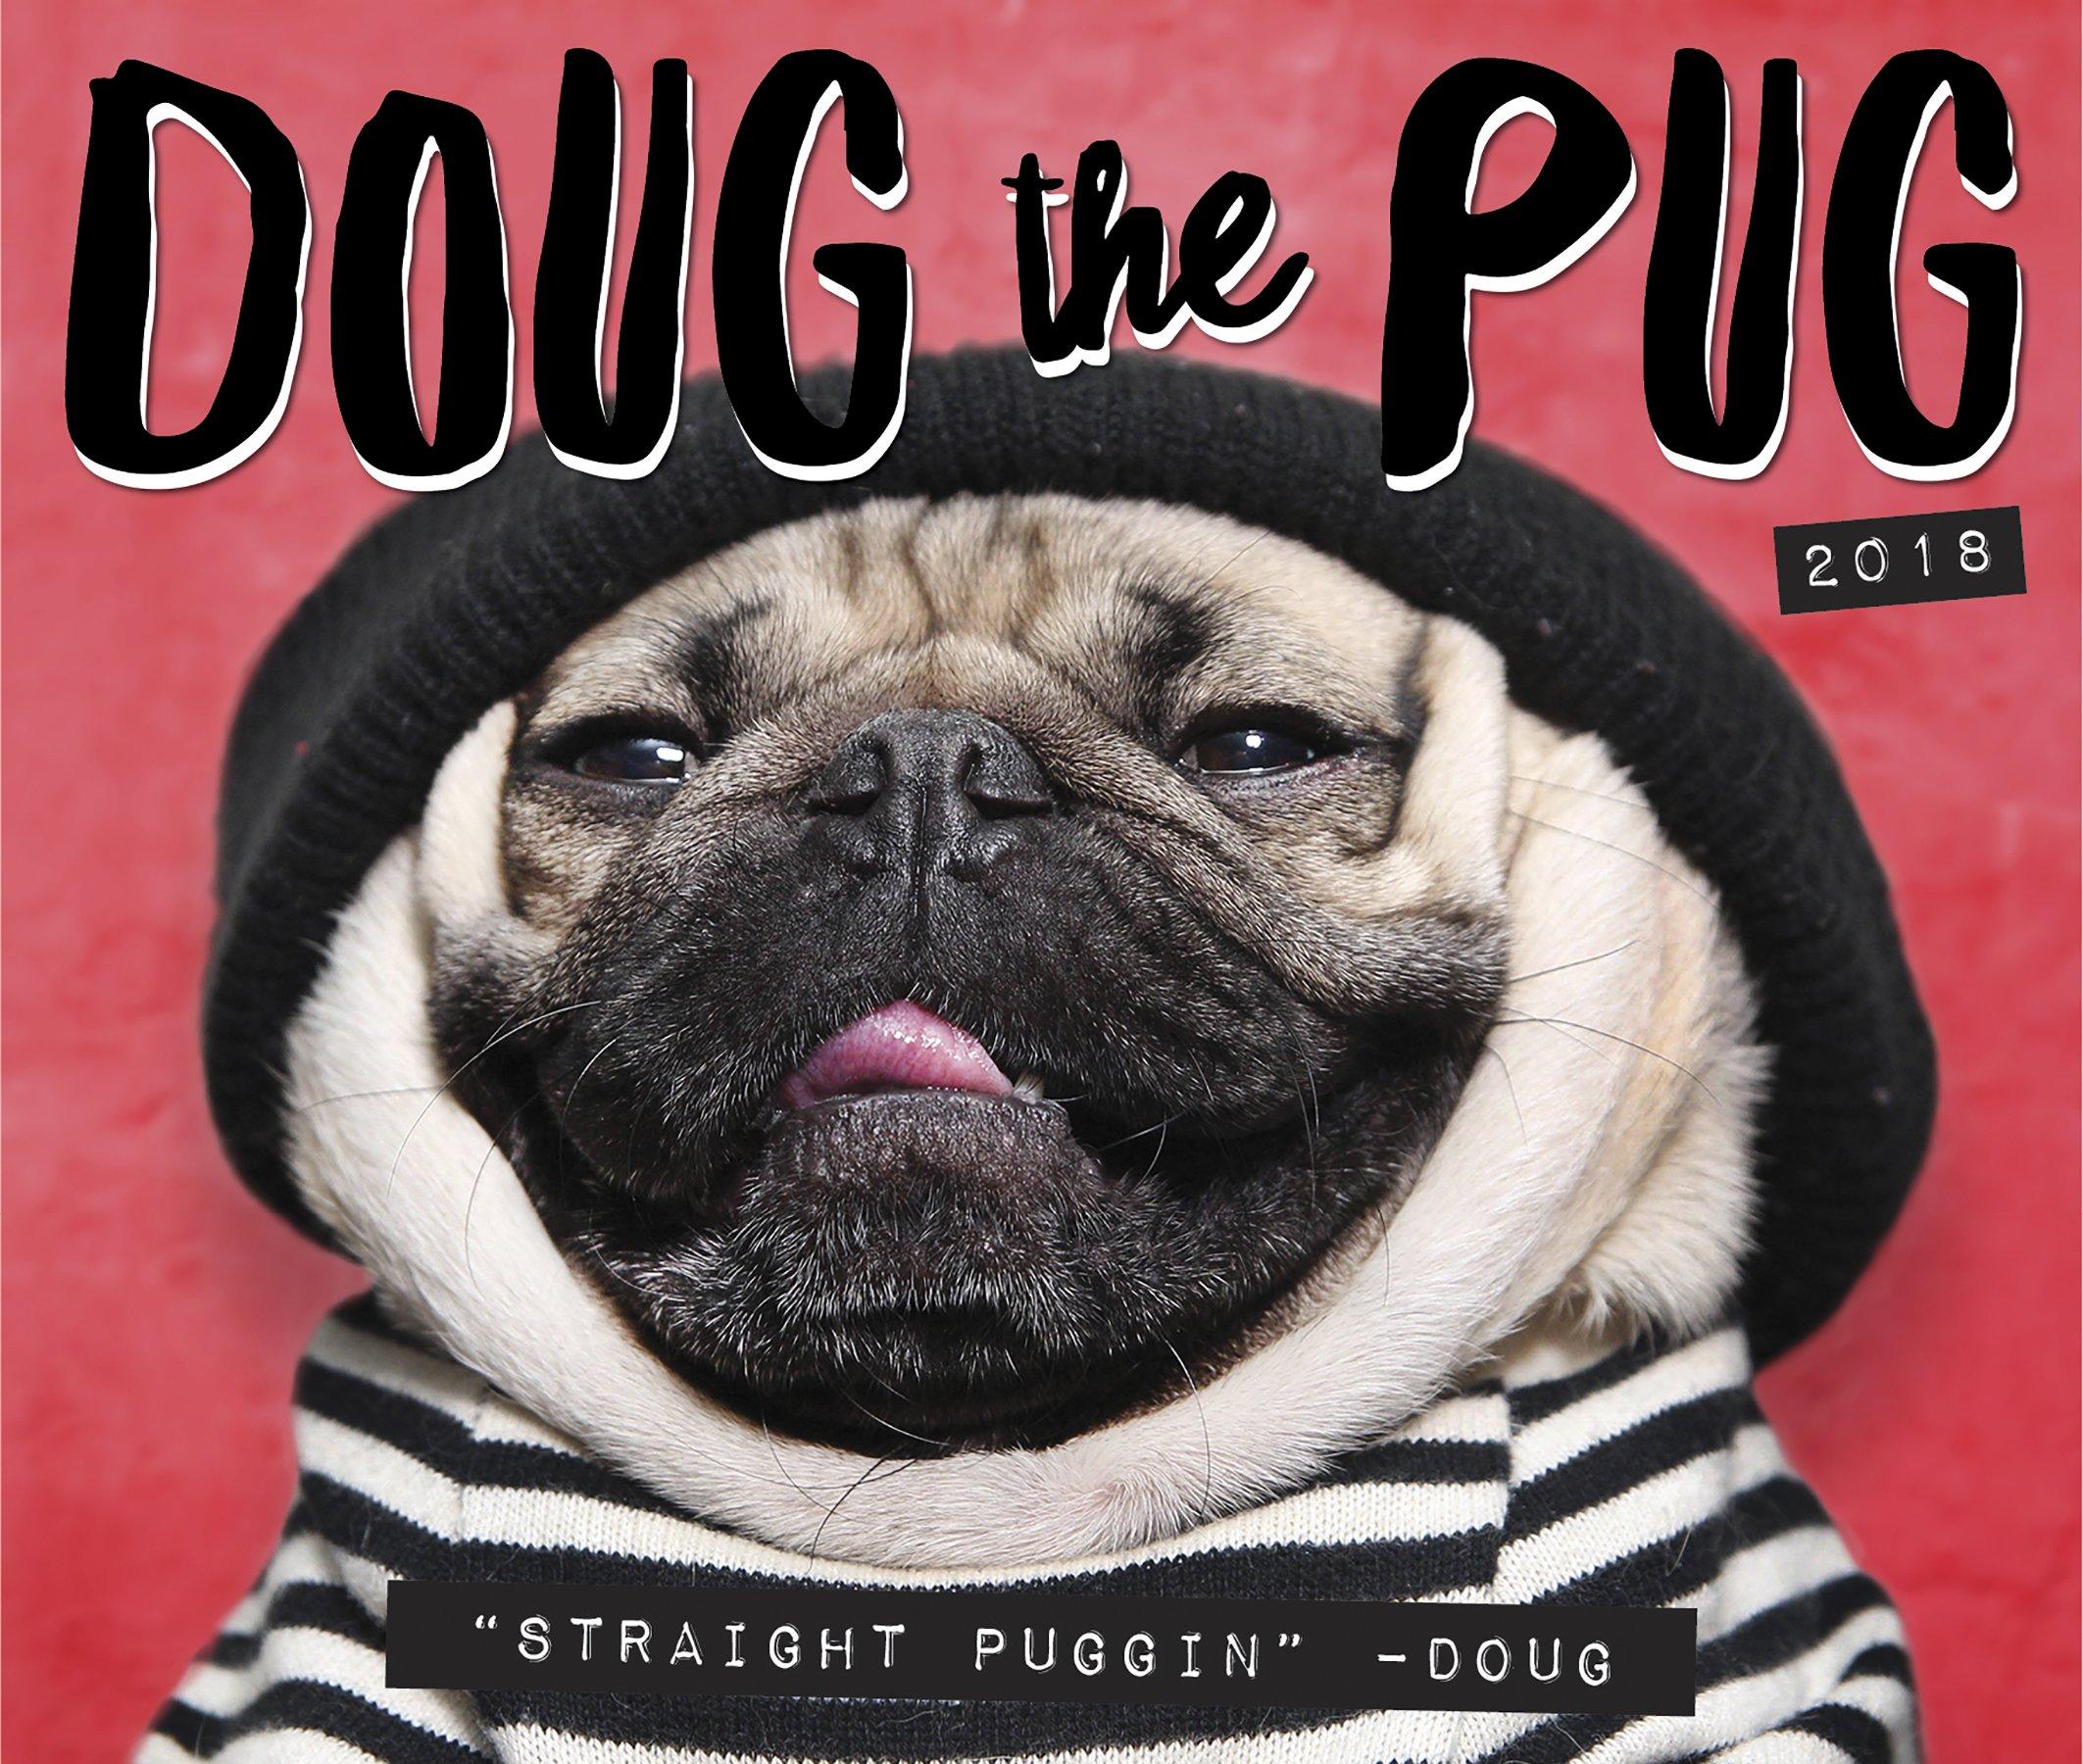 Doug the pug 2018 box calendar leslie mosier 9781682346761 amazon doug the pug 2018 box calendar leslie mosier 9781682346761 amazon books m4hsunfo